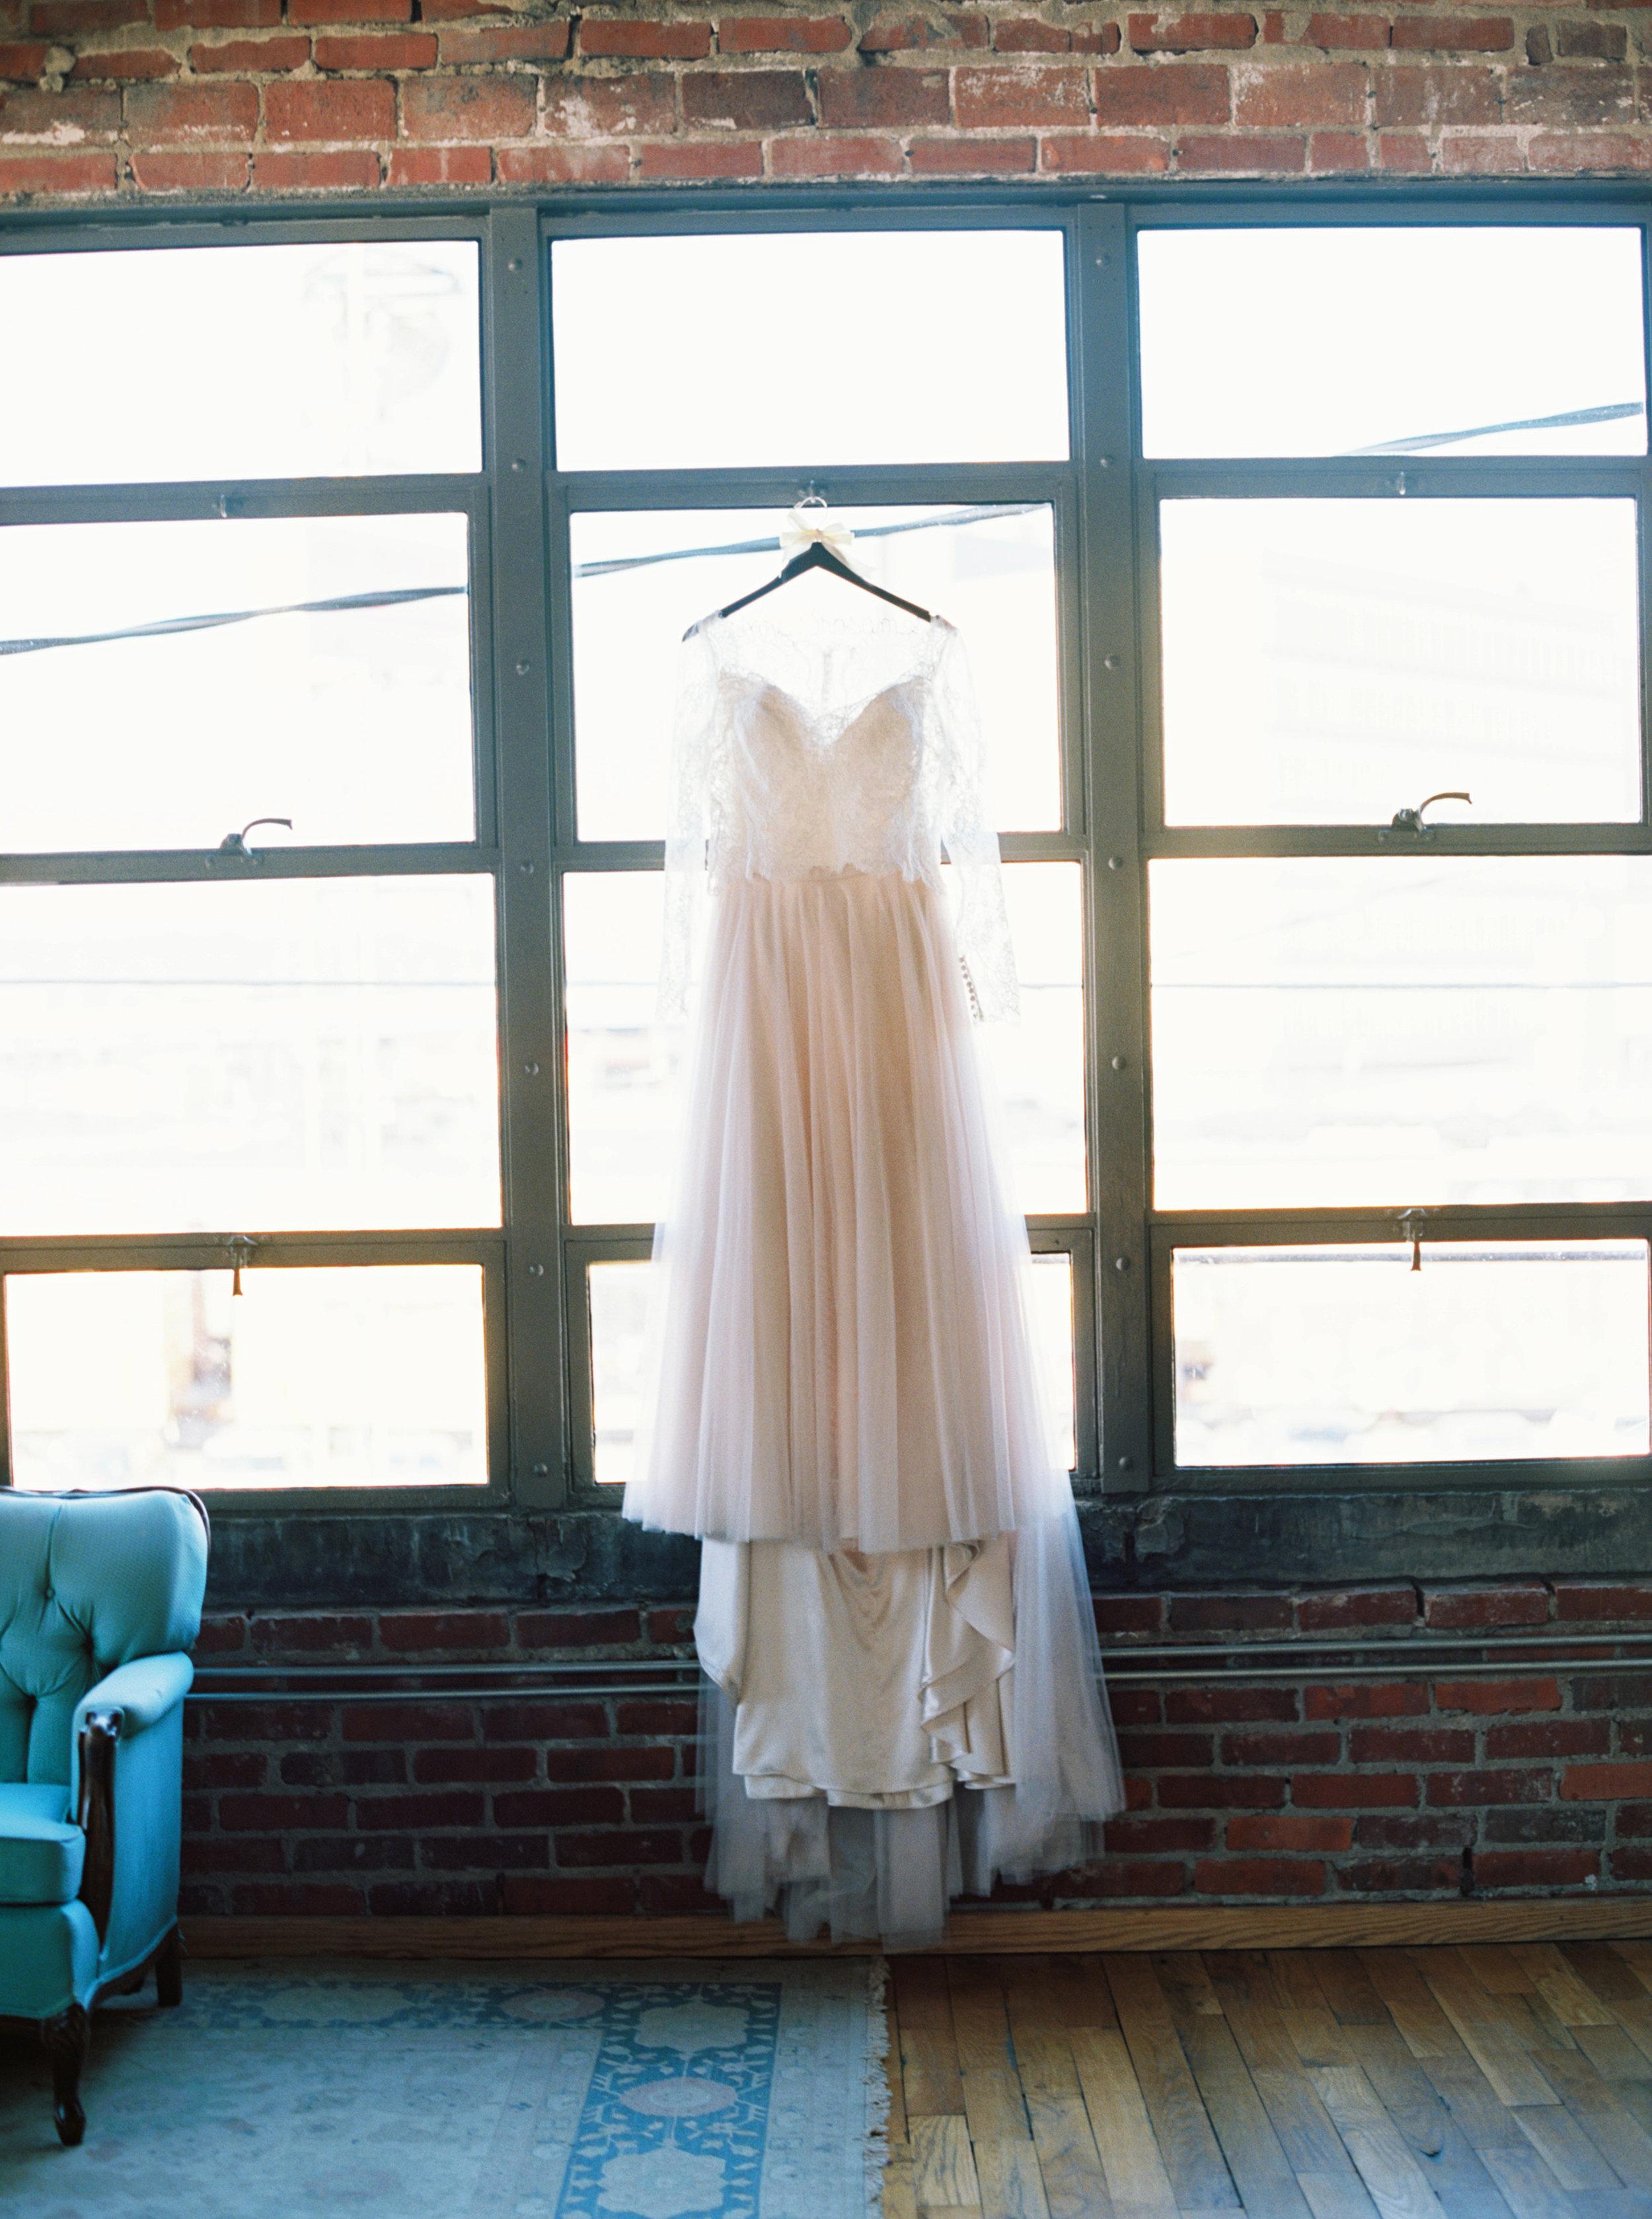 Lauren_Jeremy_Standard_Wedding_Knoxville_Abigail_Malone_Photography_FIlm-6.jpg